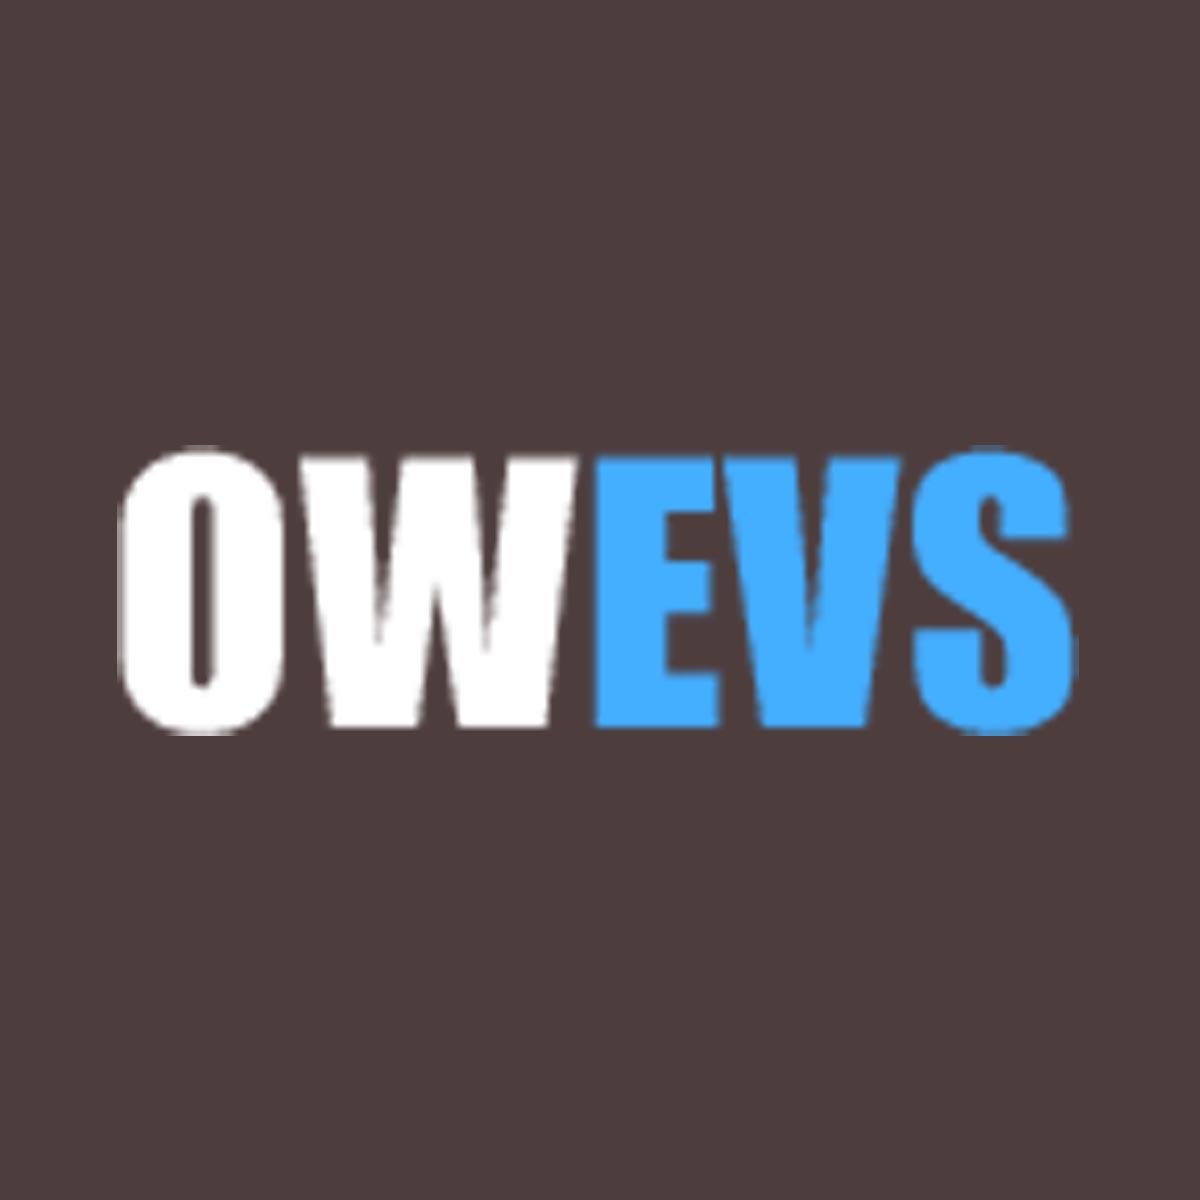 owevs logo